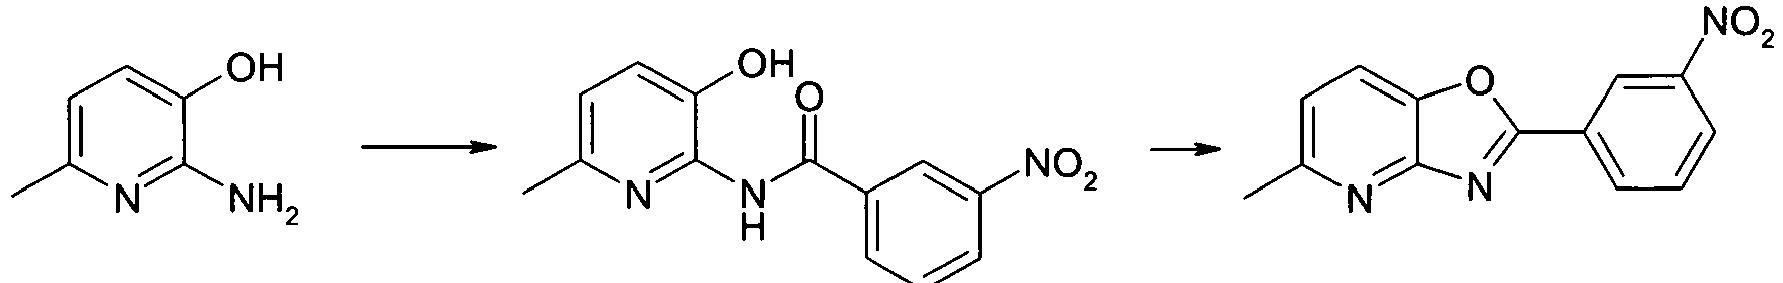 Figure imgb0304